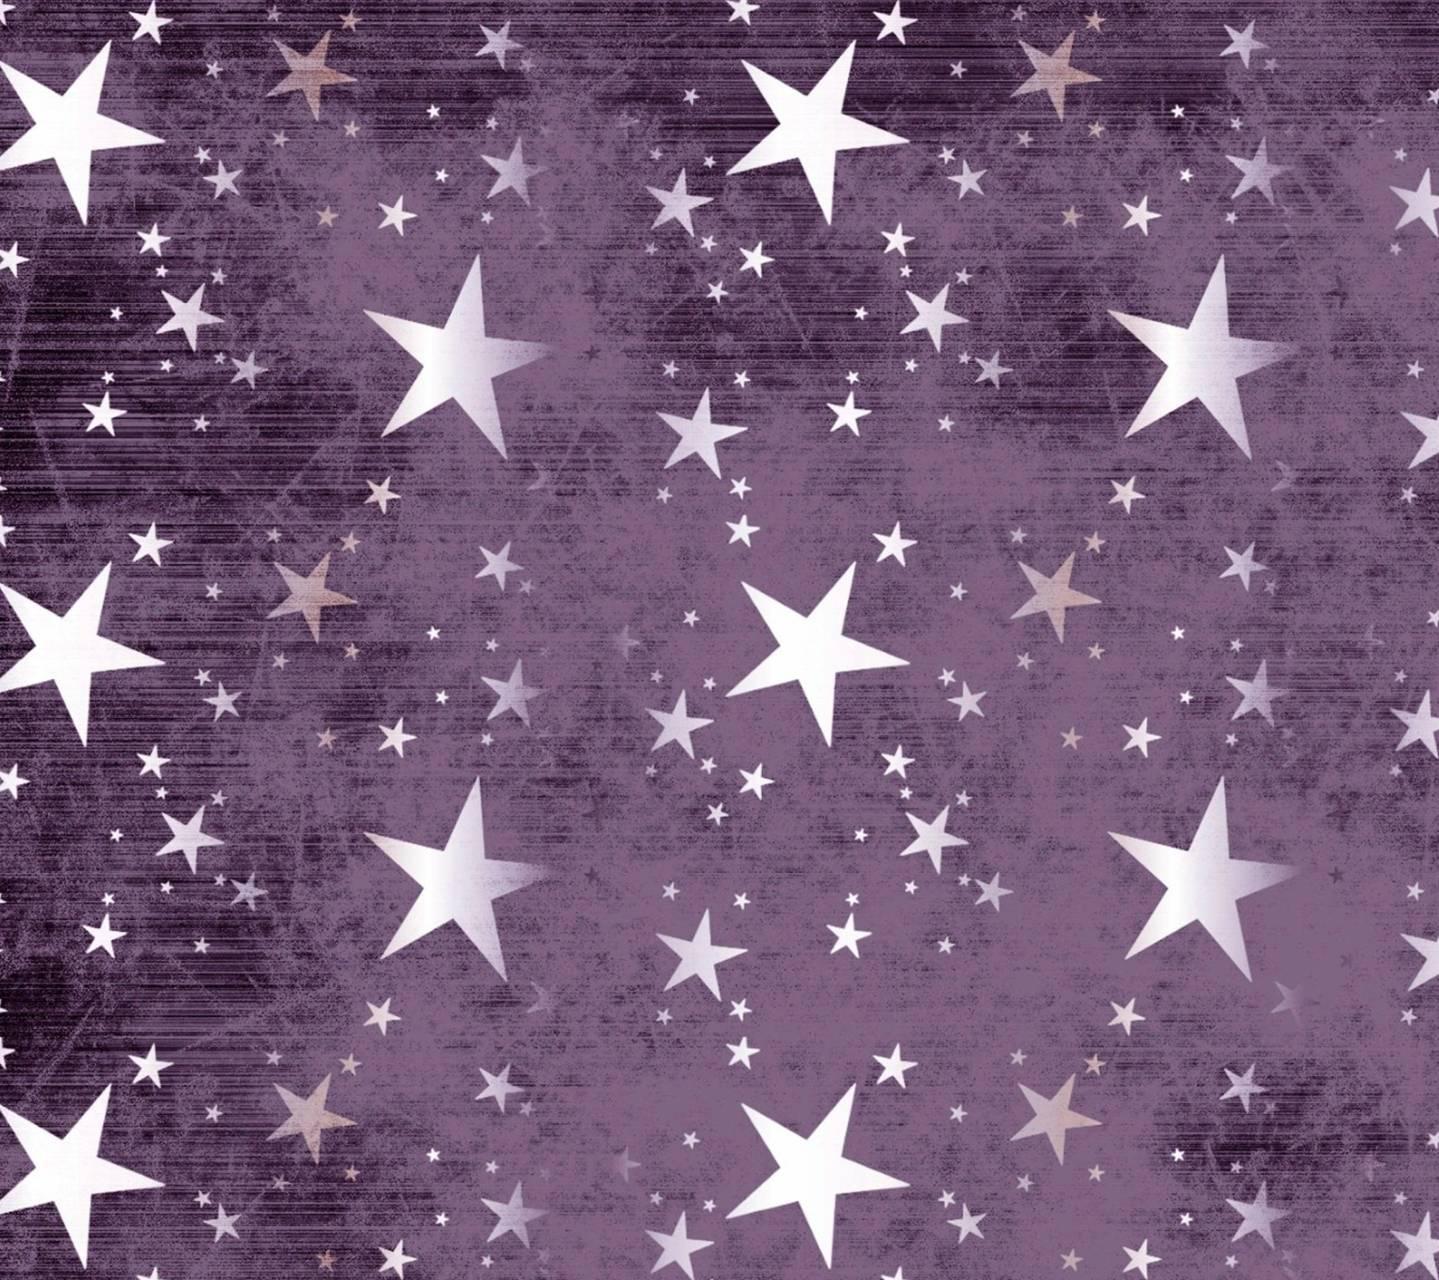 Star Textures